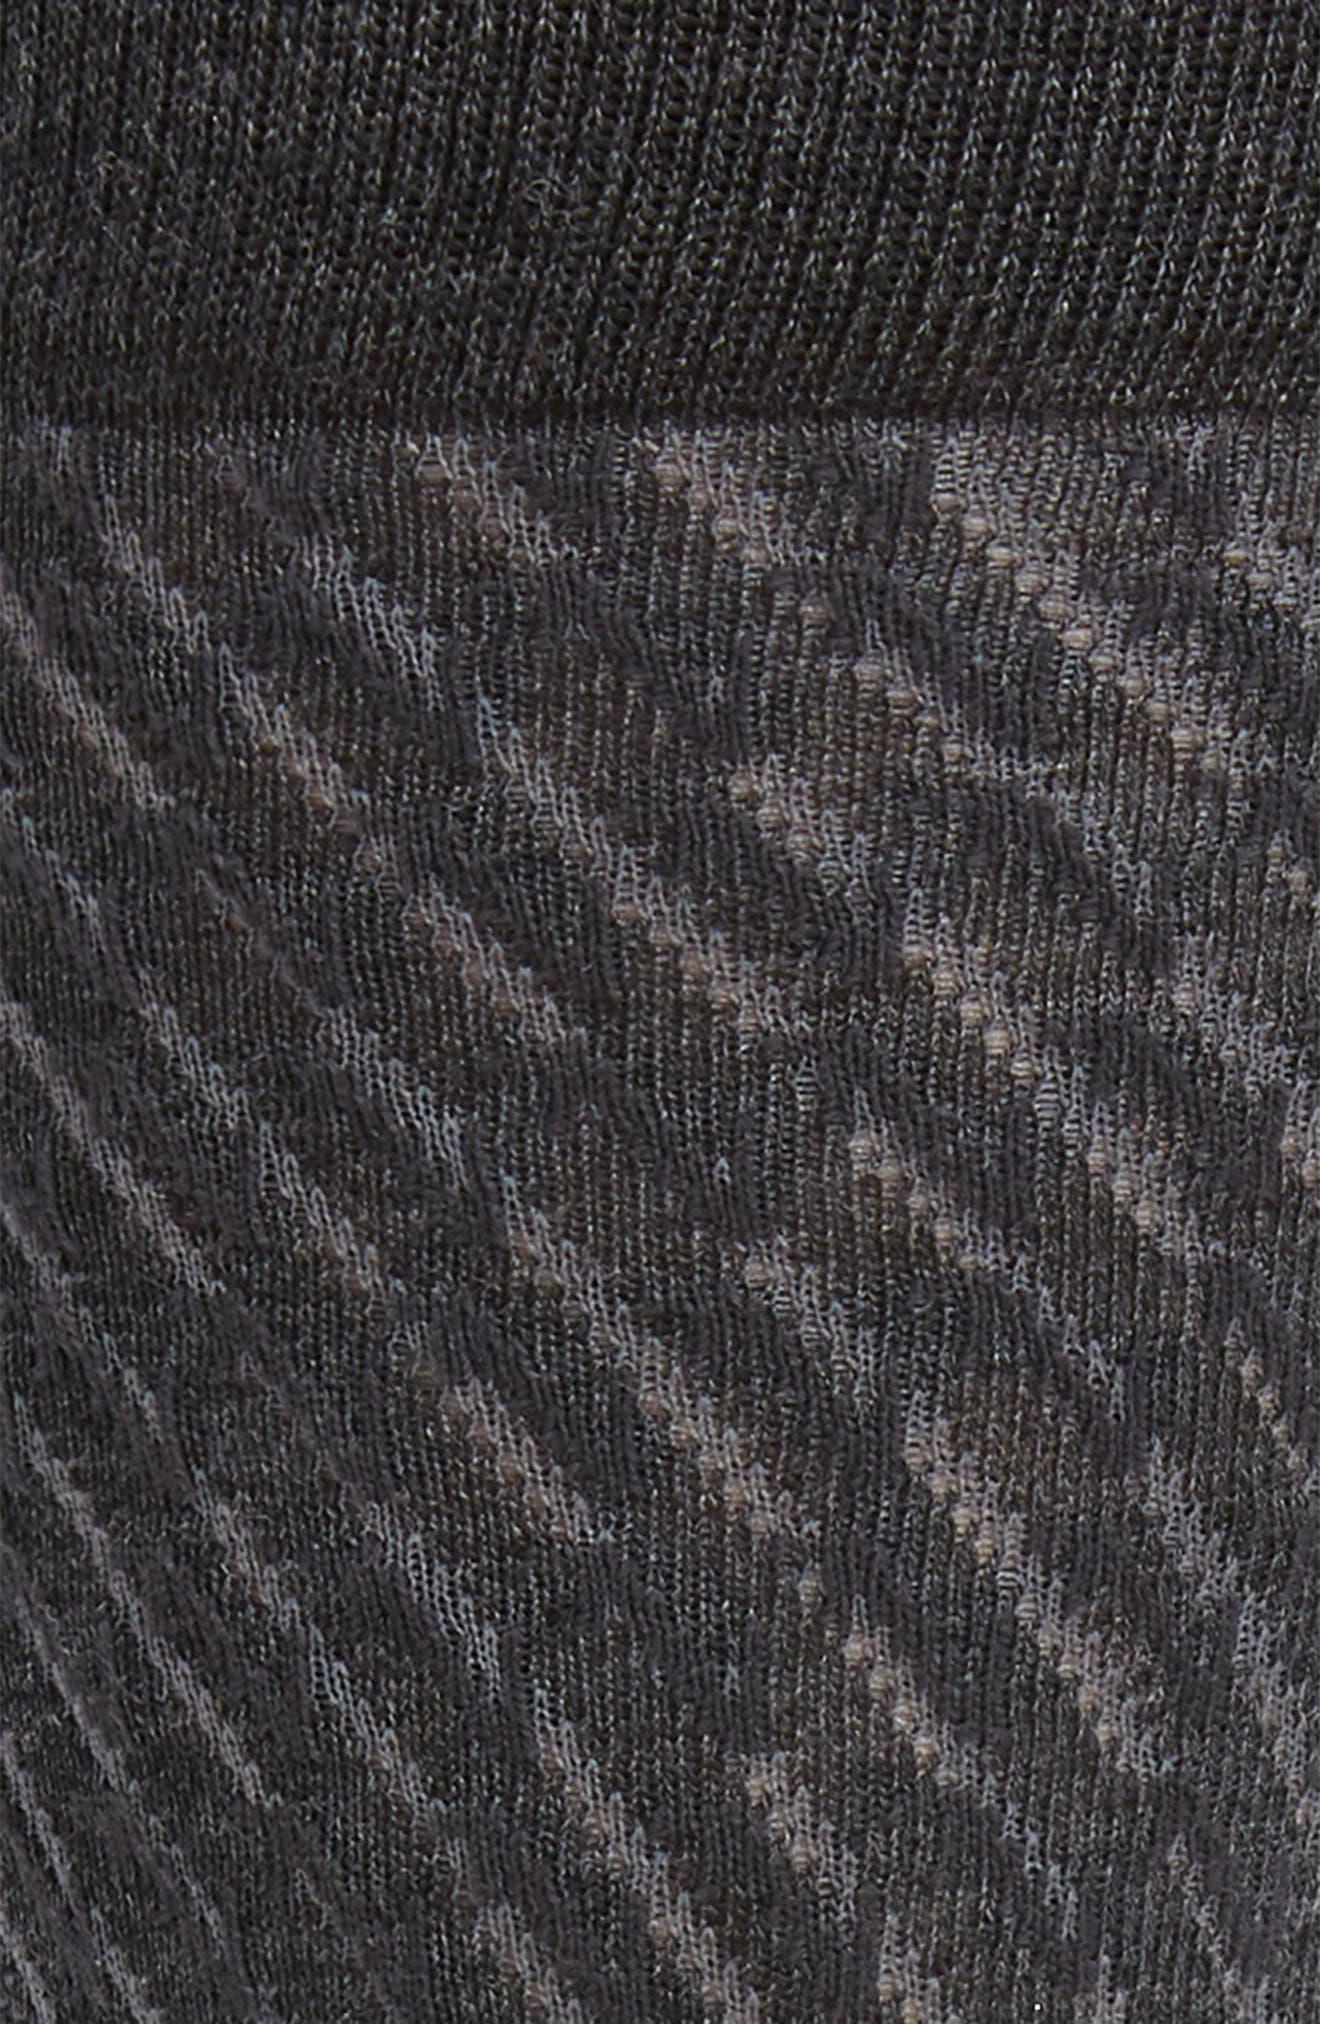 Stripe Socks,                             Alternate thumbnail 2, color,                             021